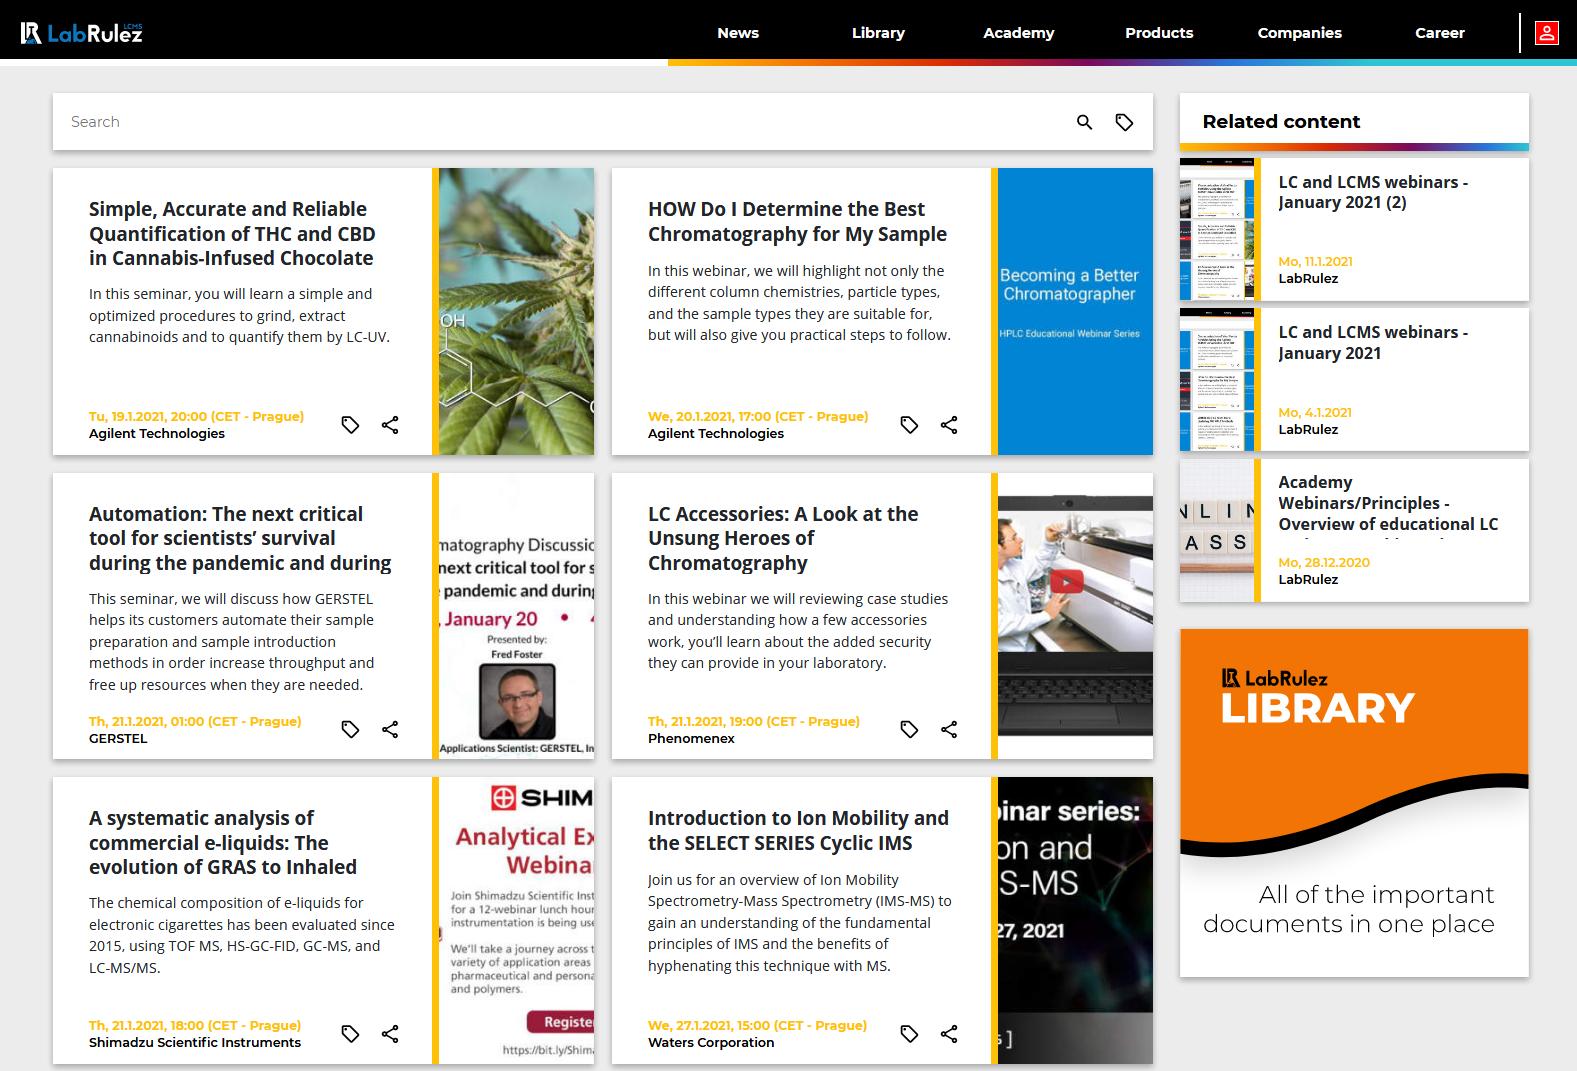 LabRulez: LC and LCMS webinars - Week 3